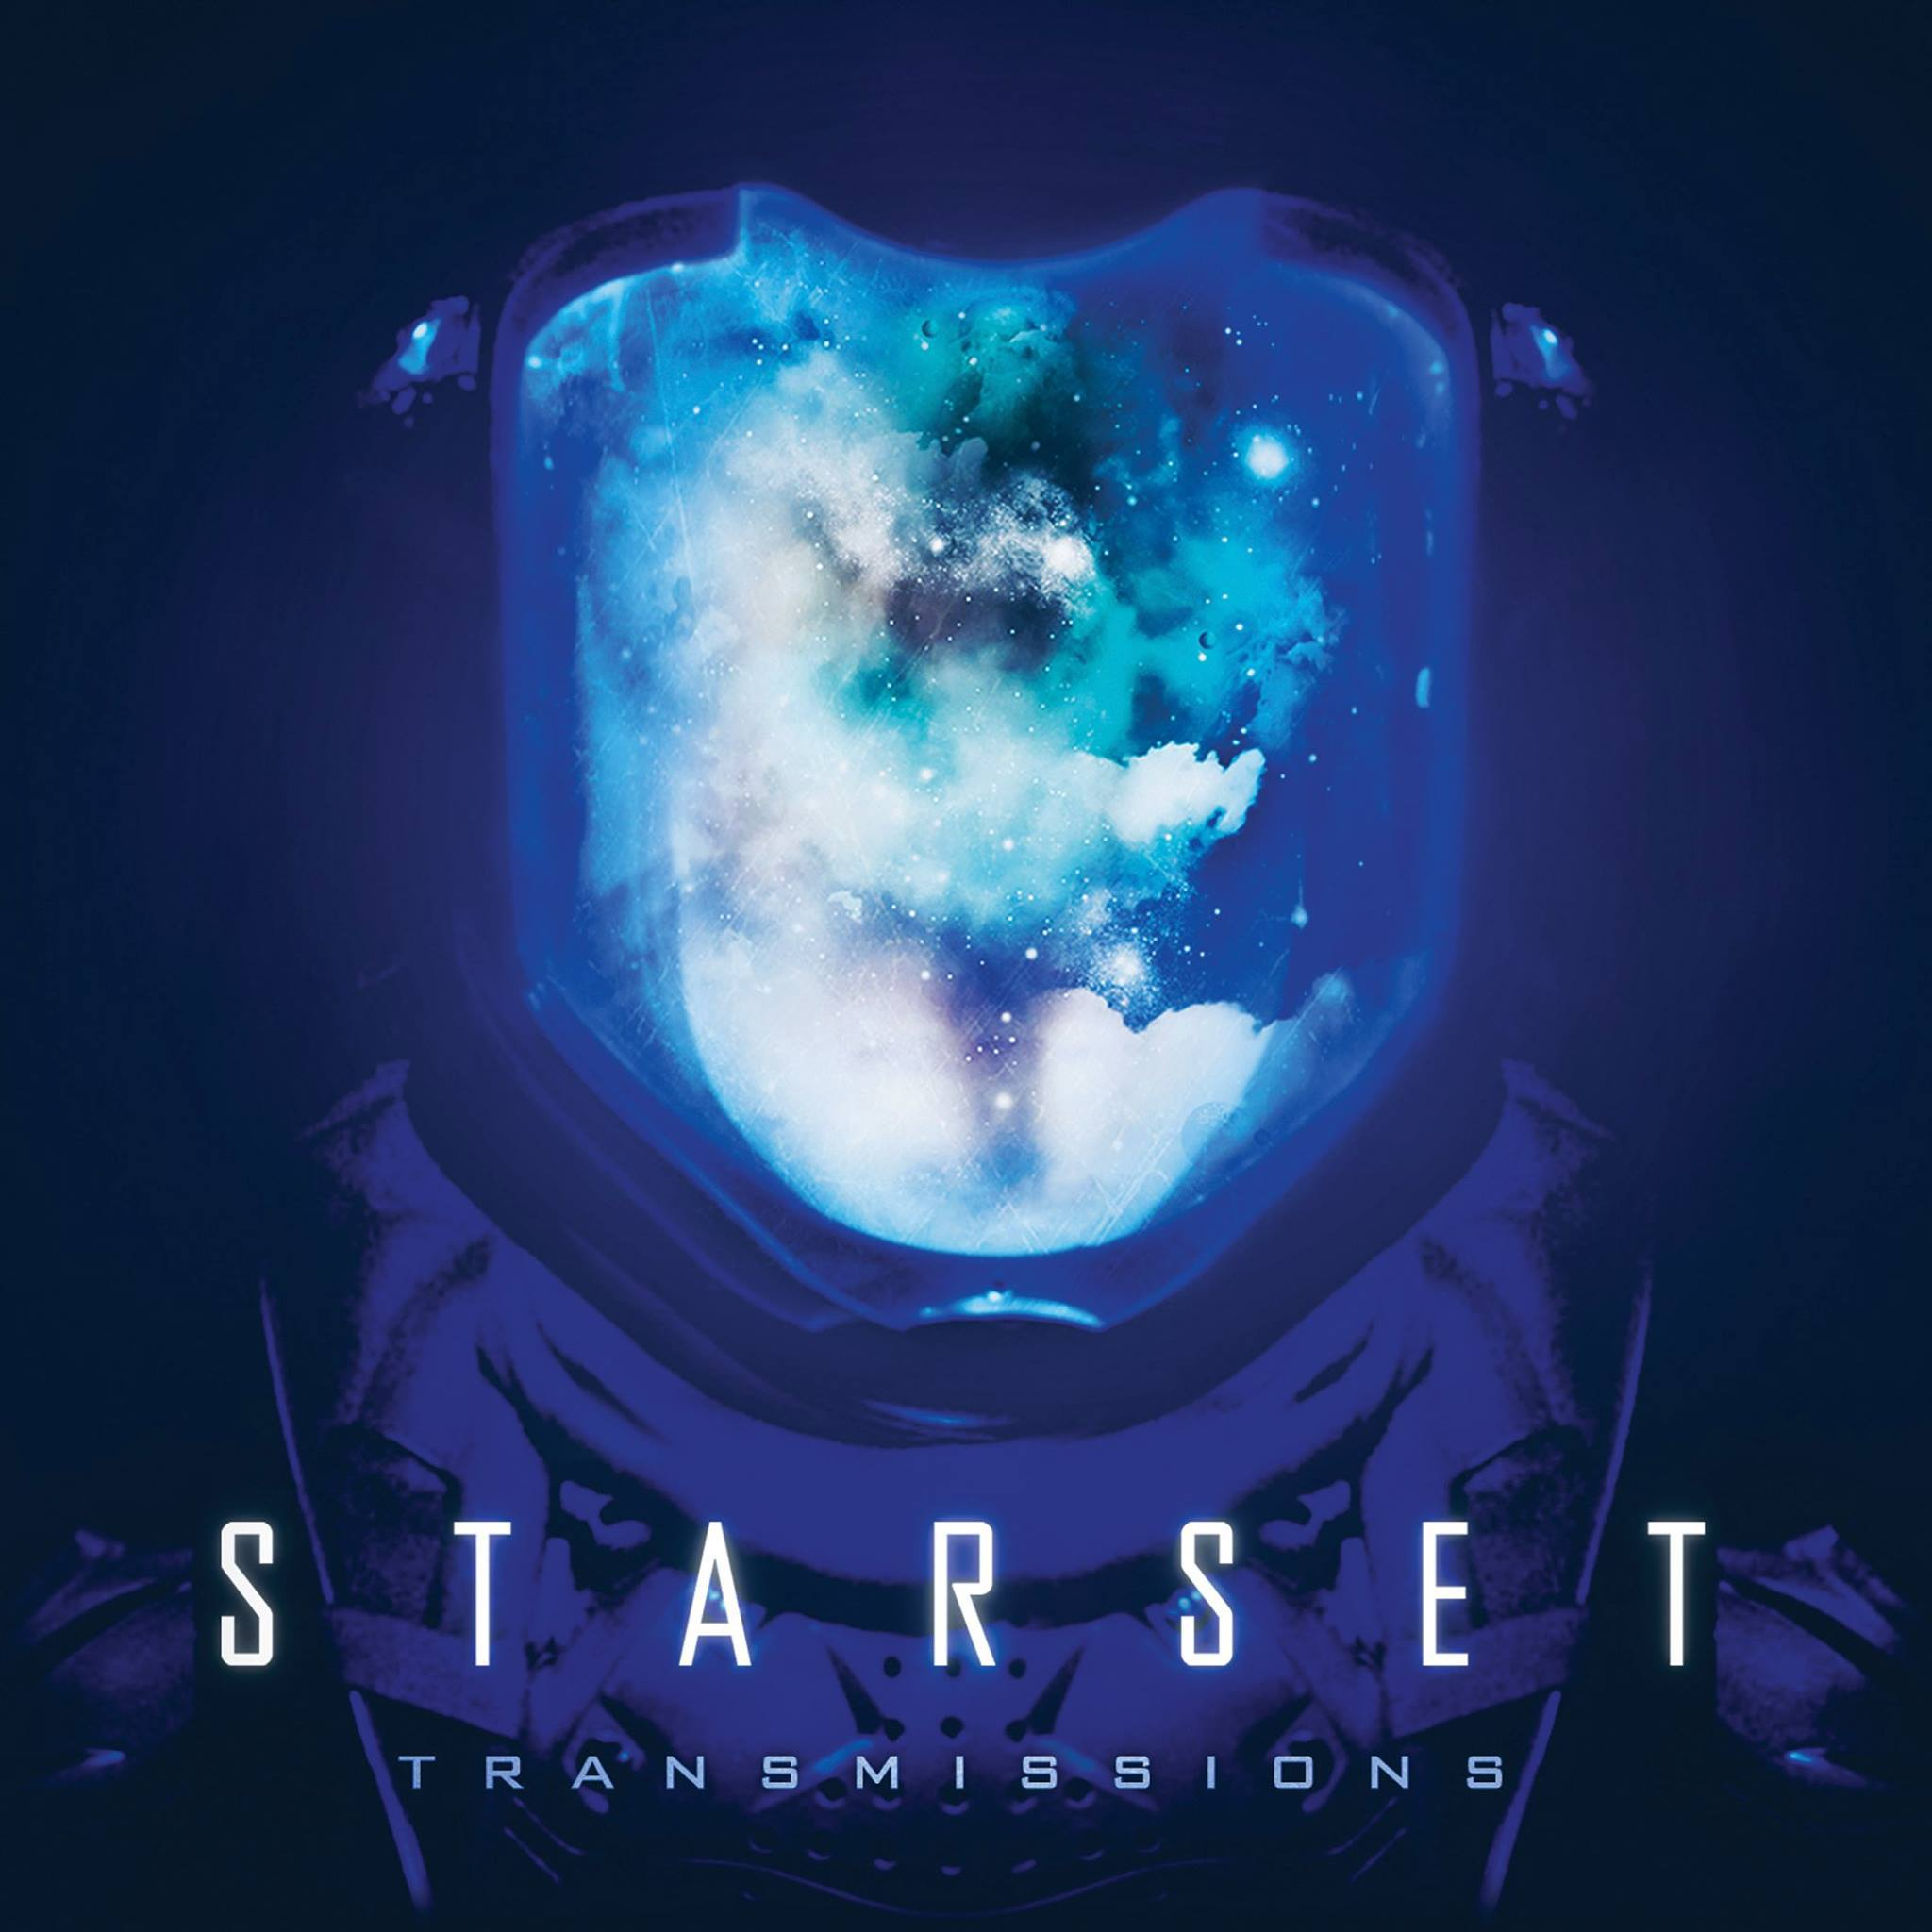 Starset - Transmissions (2014)